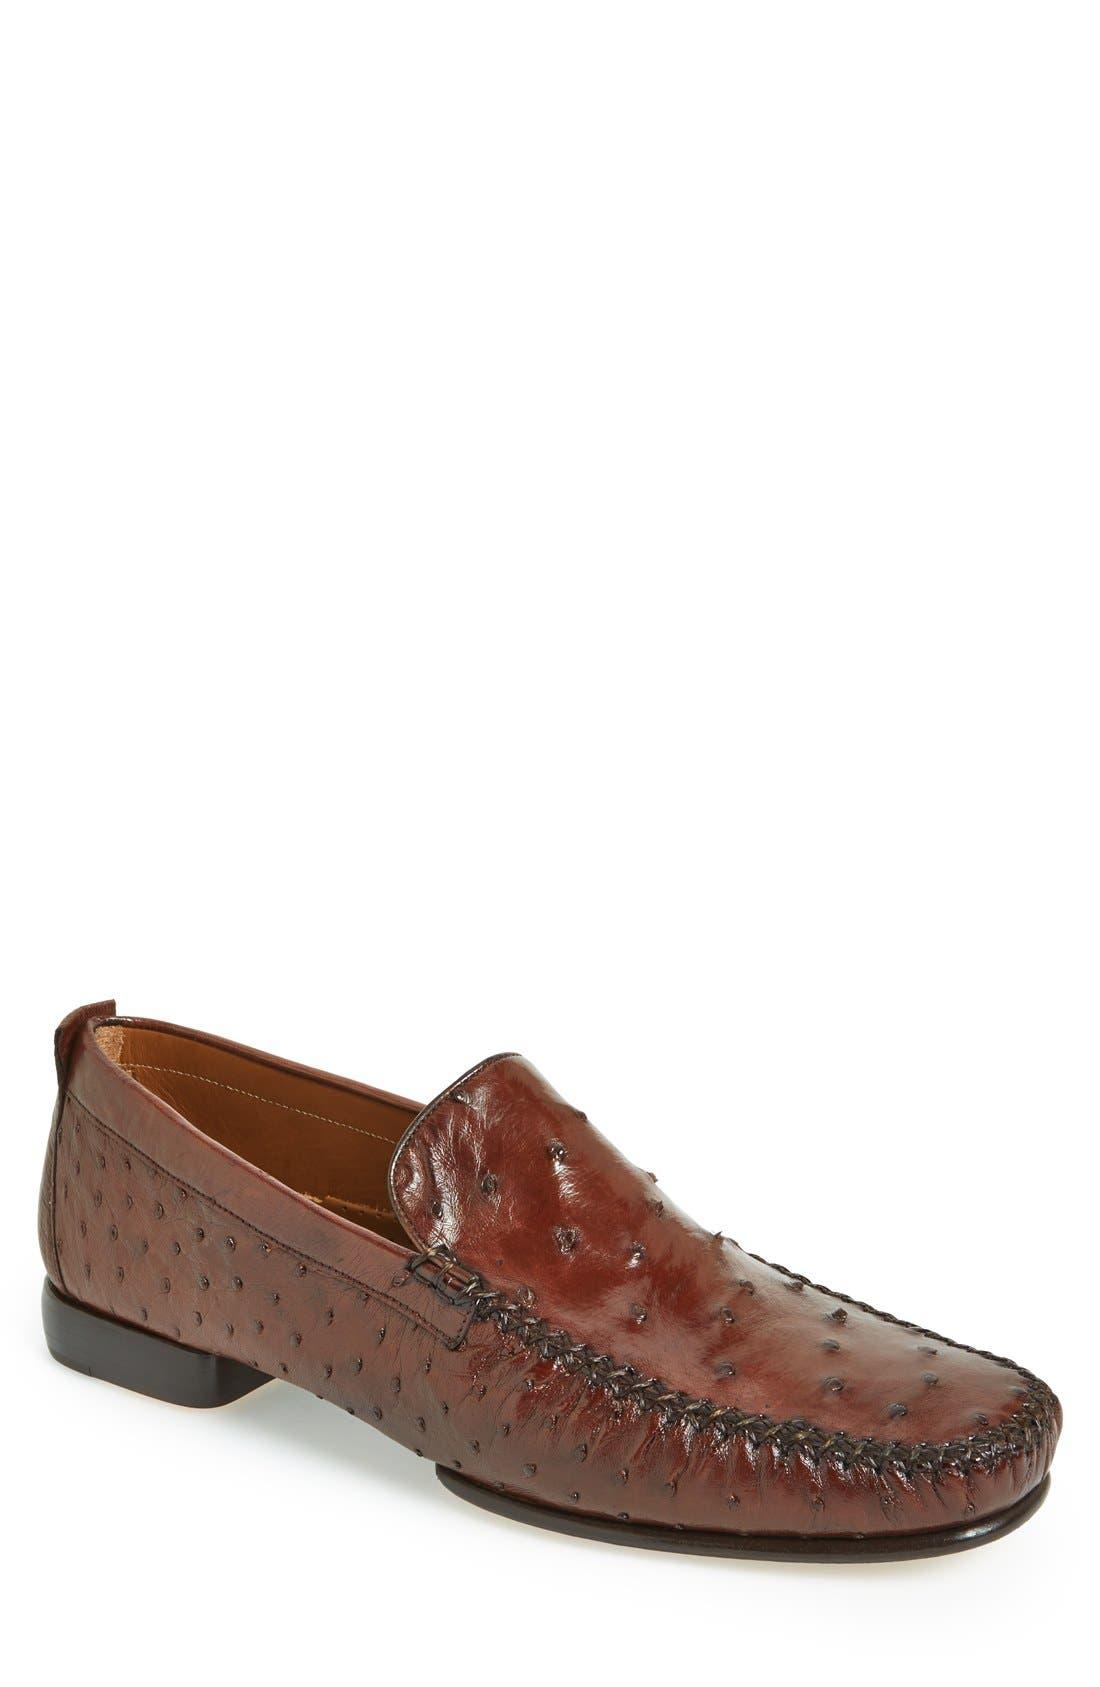 'Rollini' Ostrich Leather Loafer,                         Main,                         color, TOBACCO